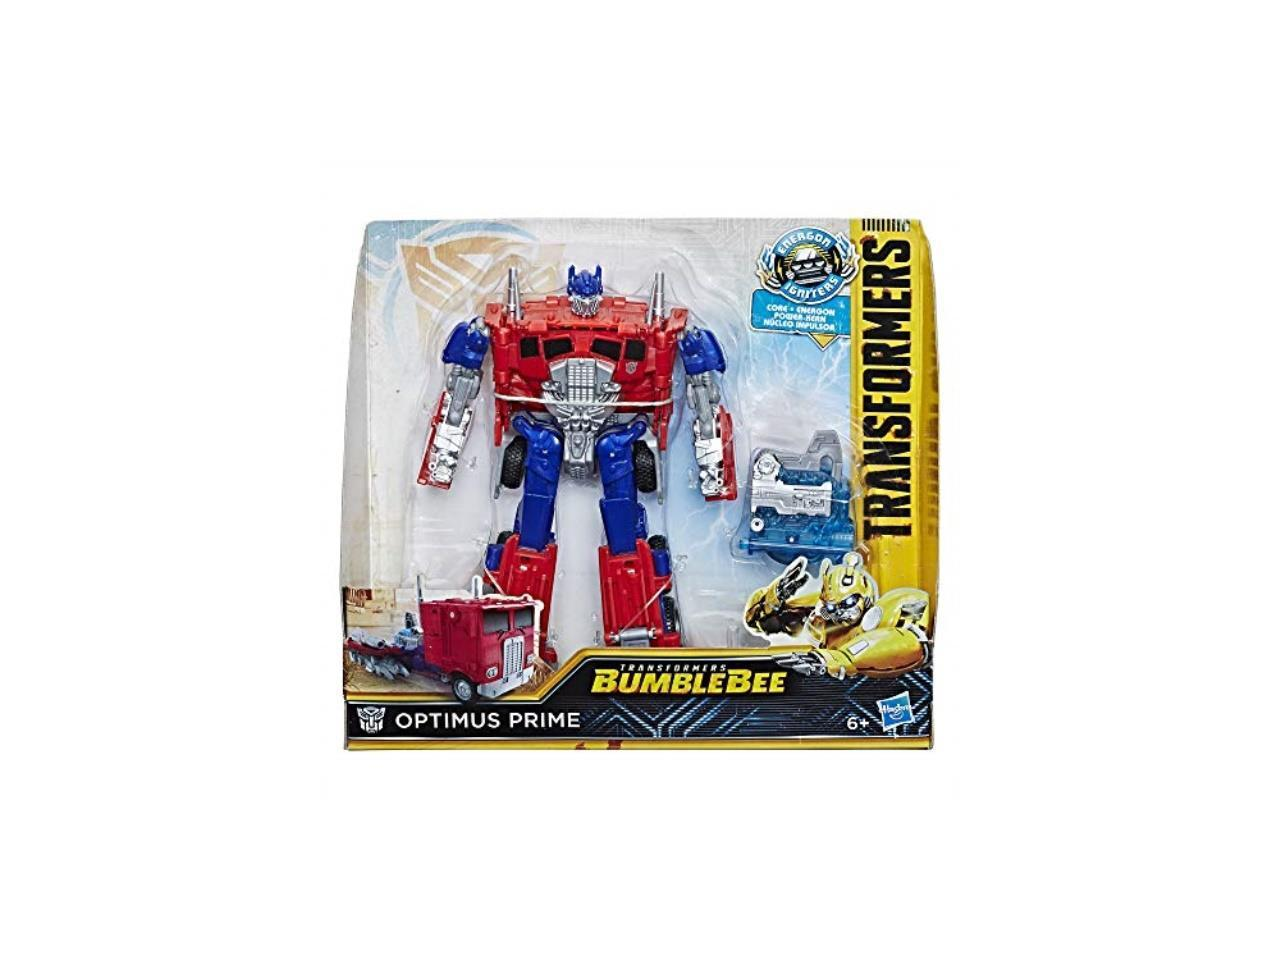 Bumblebee Movie Toys Energon Igniters Nitro Bumblebee Core Powers Transformers